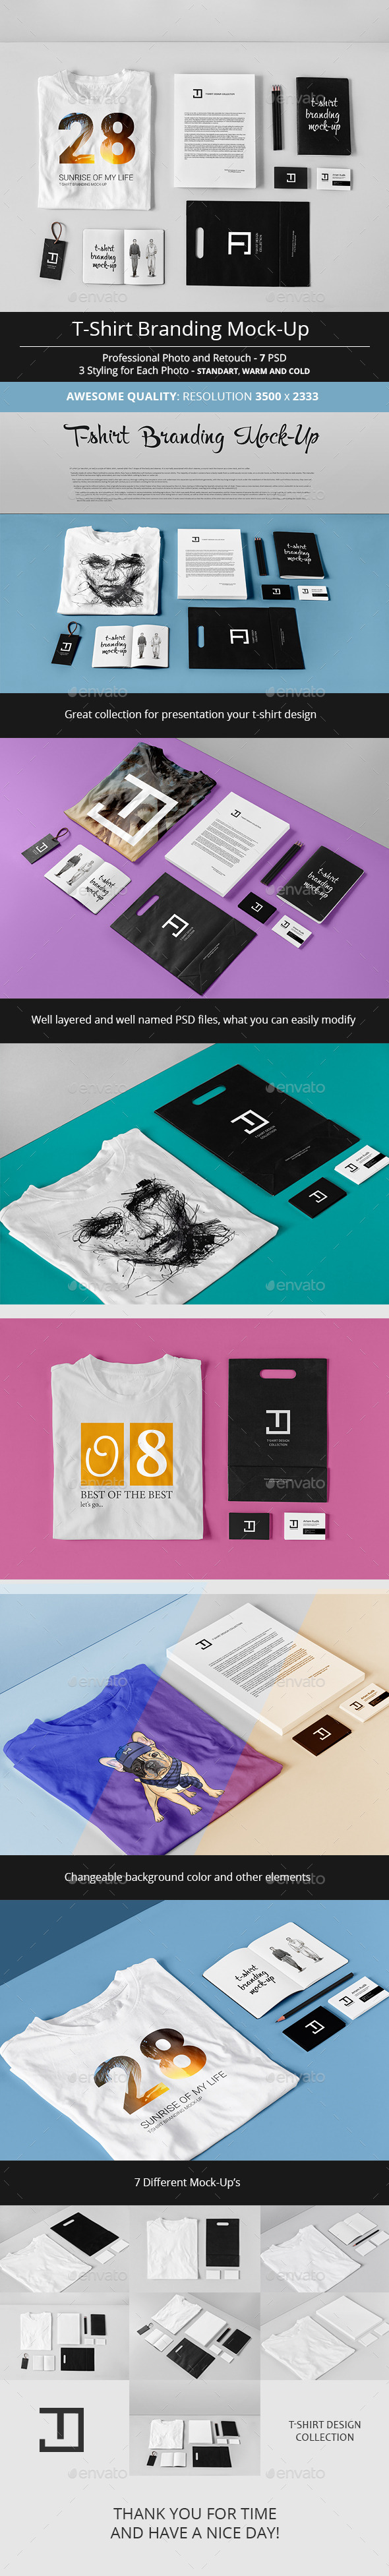 T-Shirt Branding Mock-Up